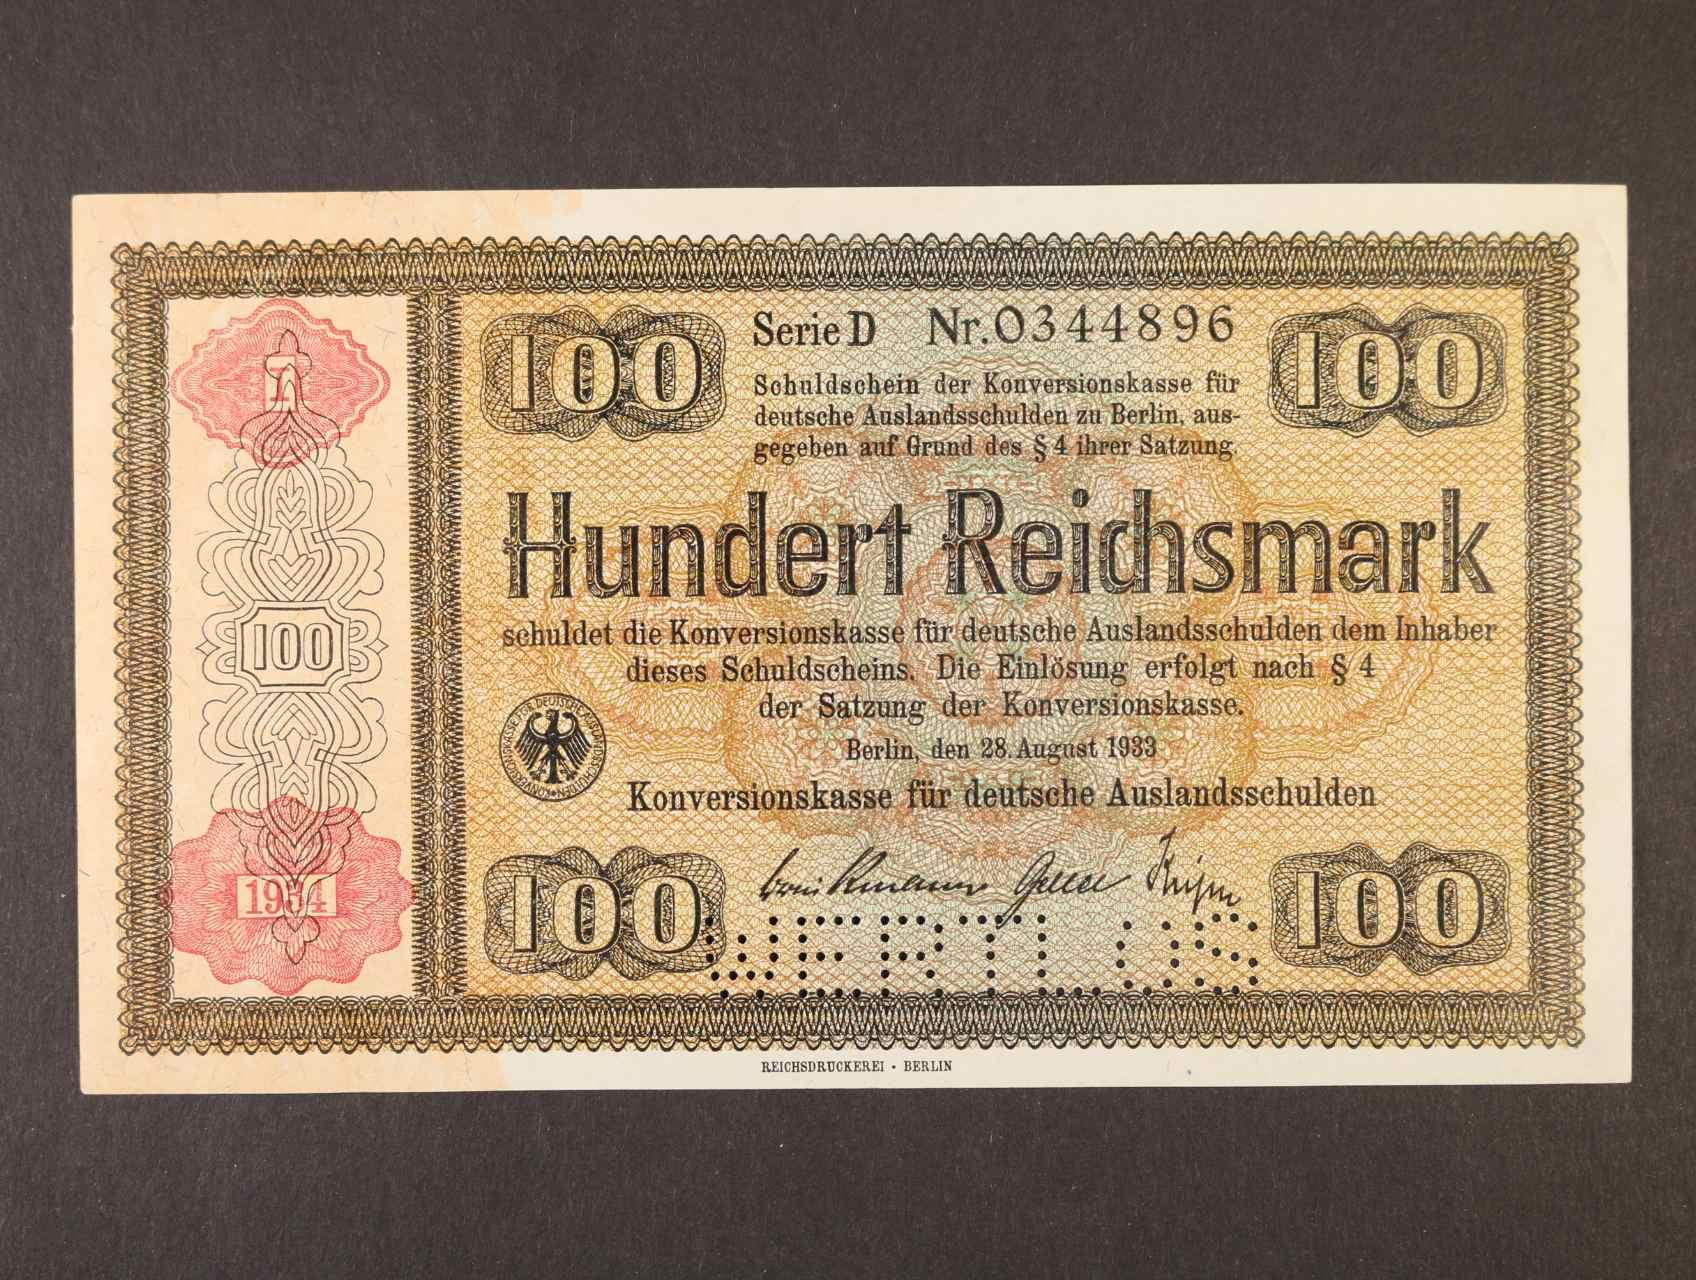 100 RM 28.8.1933 série D s přetiskem 1934  Konversionskassenschein s perf. WERTLOS, Ro. 713E2